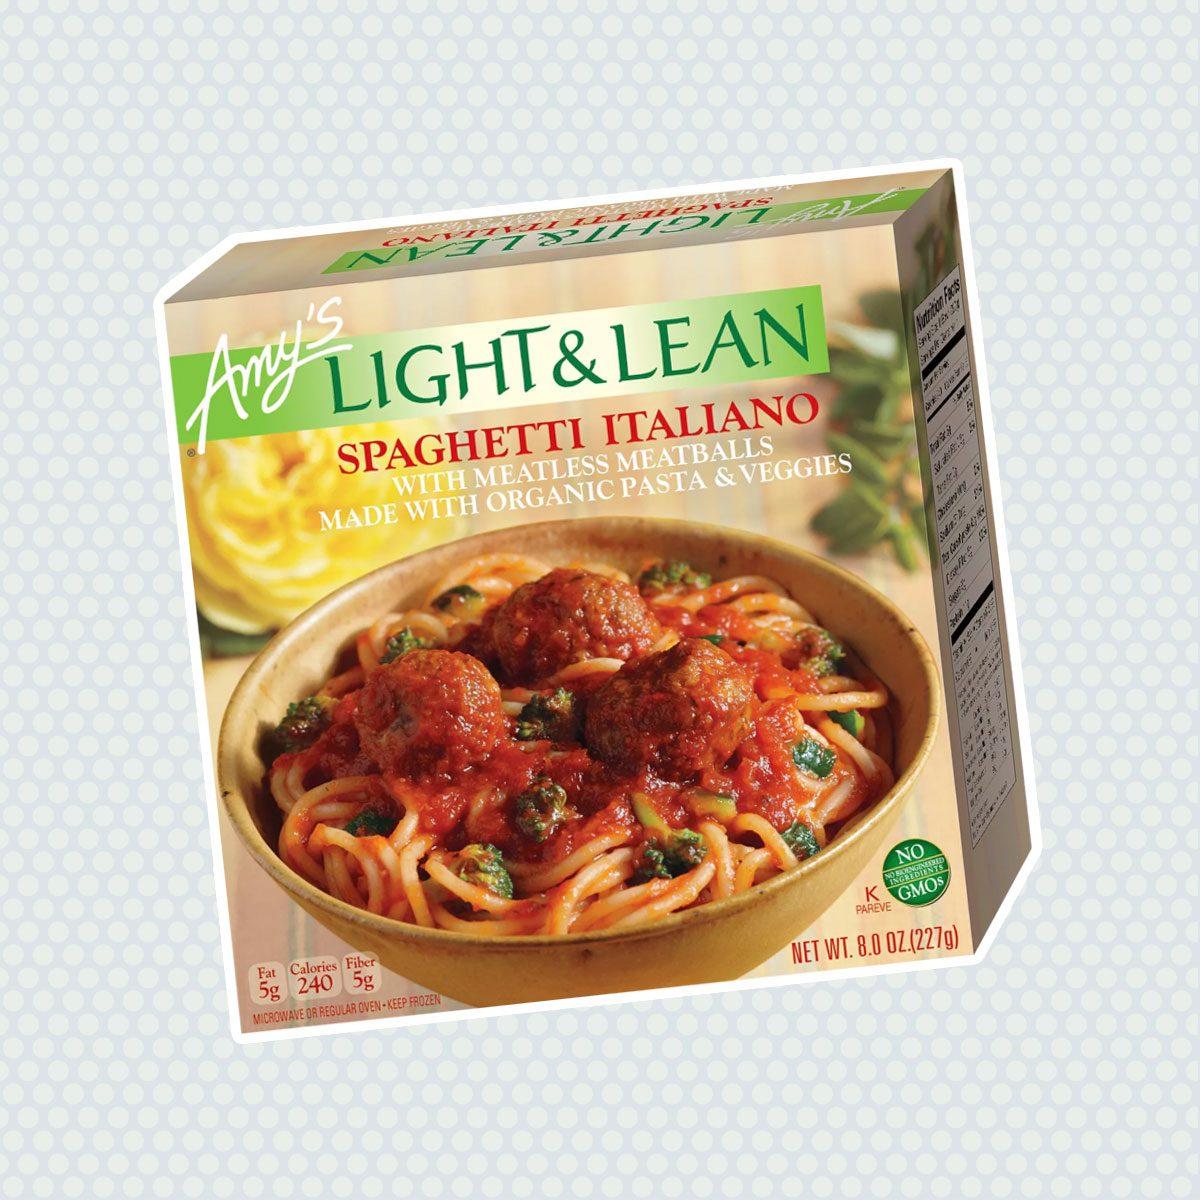 Amy's Light & Lean Frozen Spaghetti Italiano with Meatless Meatballs - 8oz